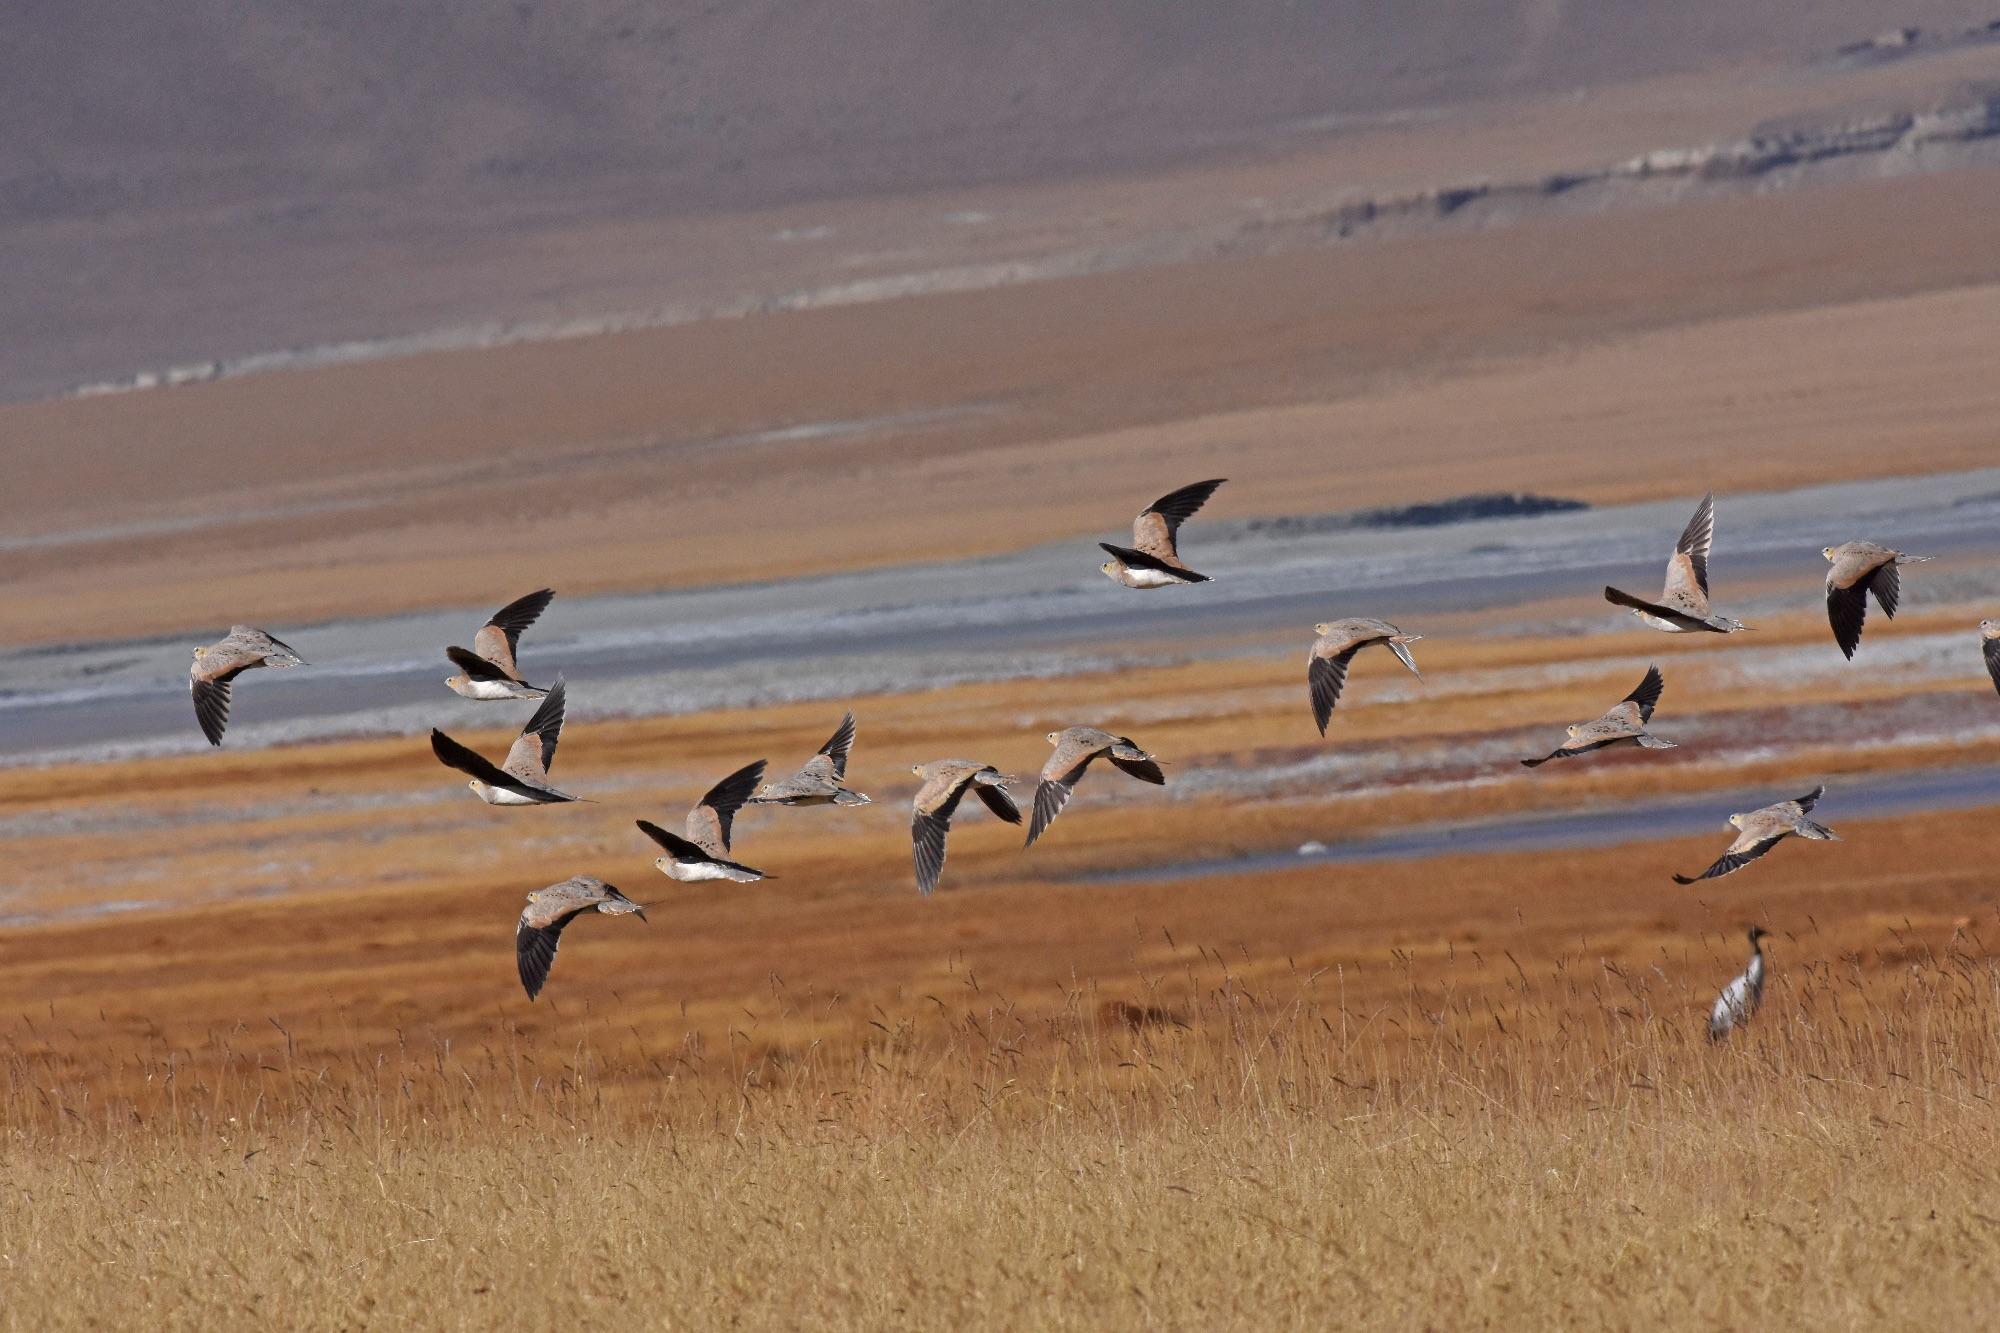 Tibetan Sandgrouse at Tso Kar Lake